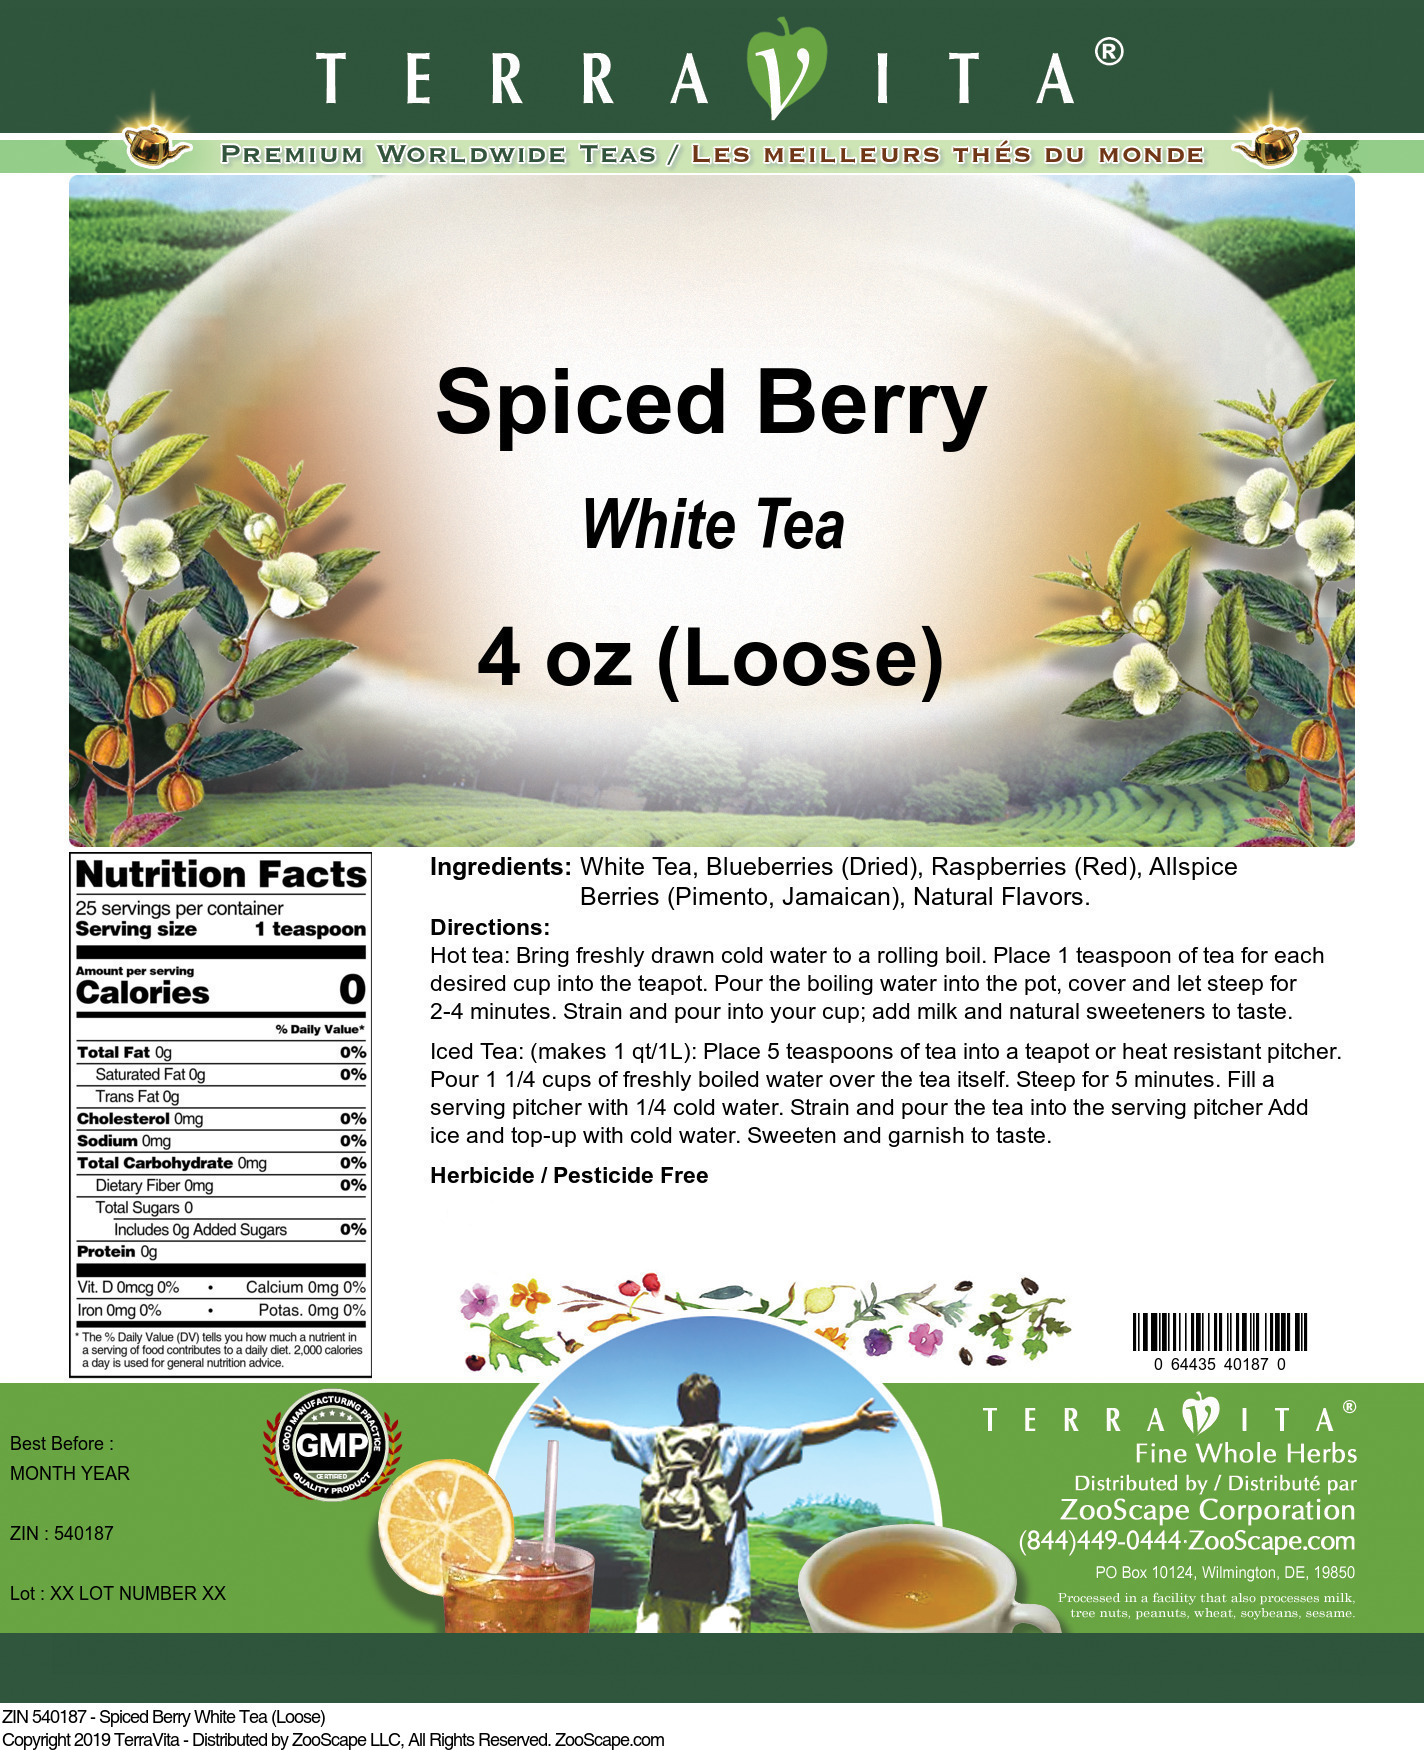 Spiced Berry White Tea